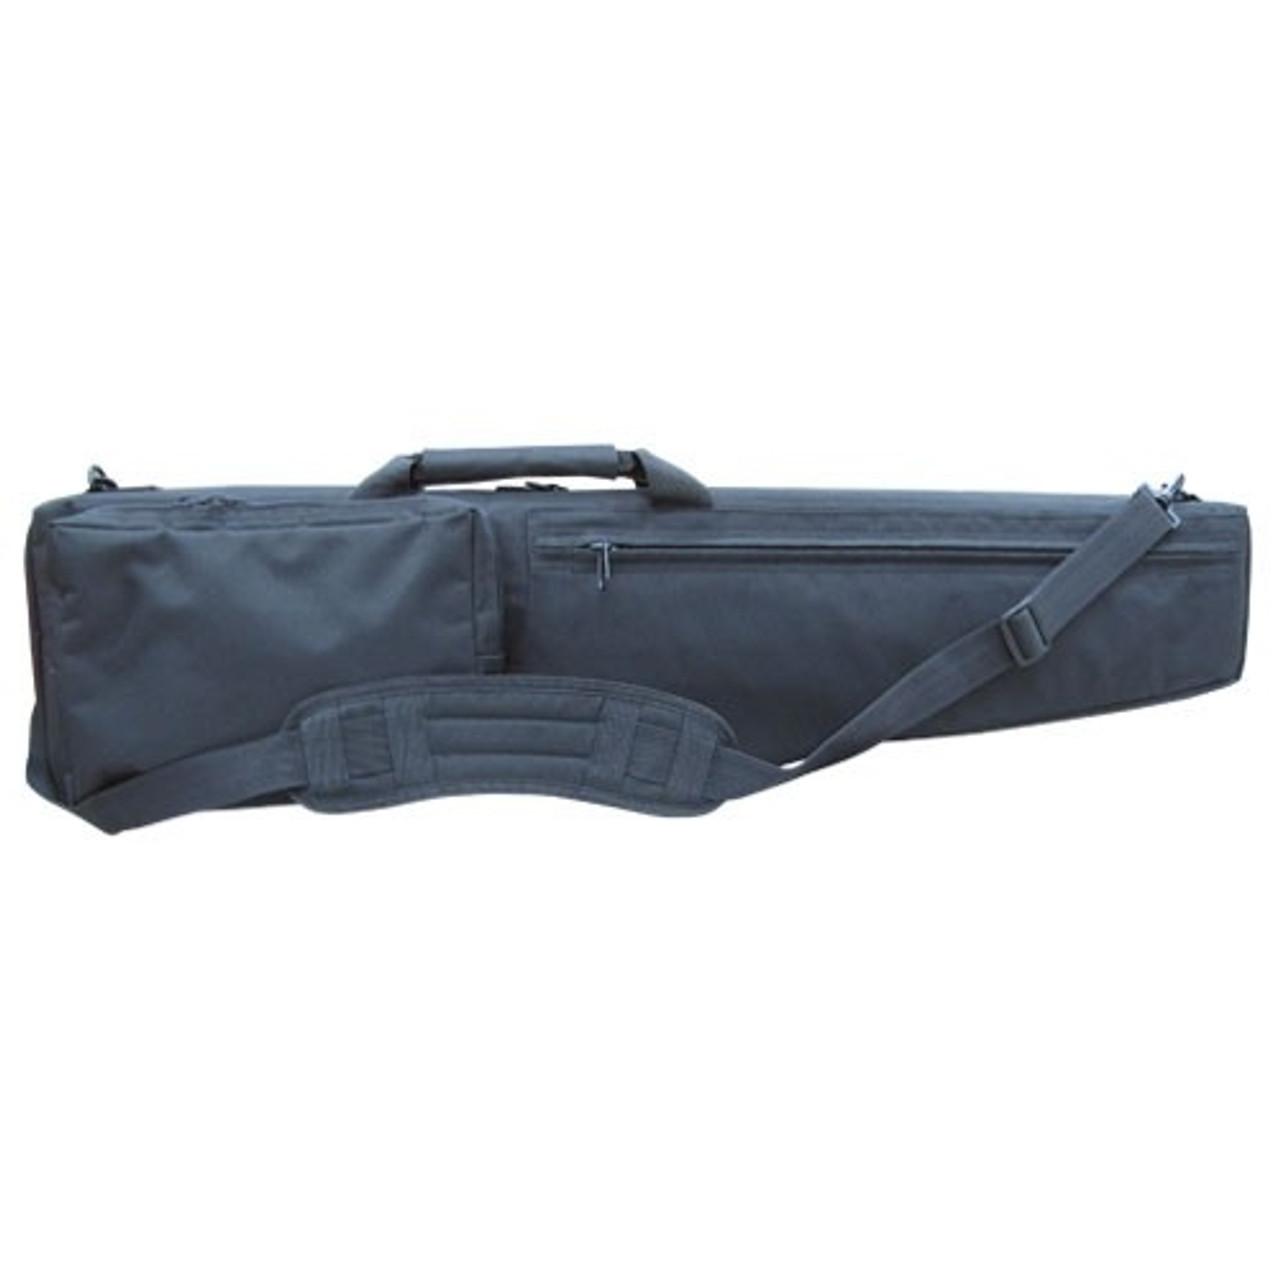 "Condor - 38"" Rifle Case (Black)"